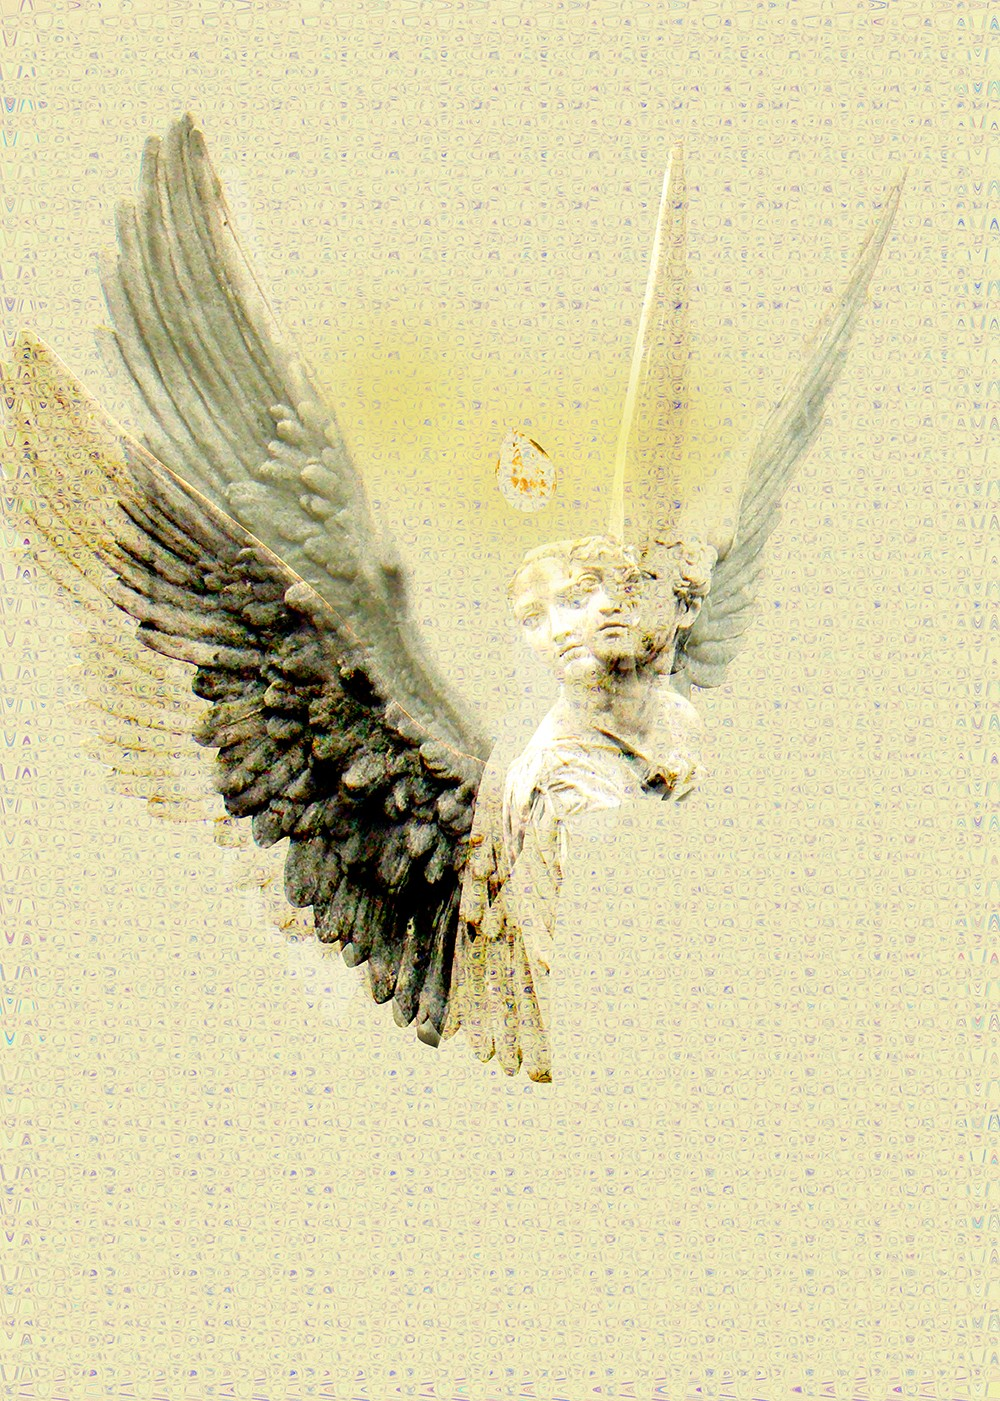 Auncer_Pizante_(Ryan) Auncer - Pizante - Angel of Antwerp